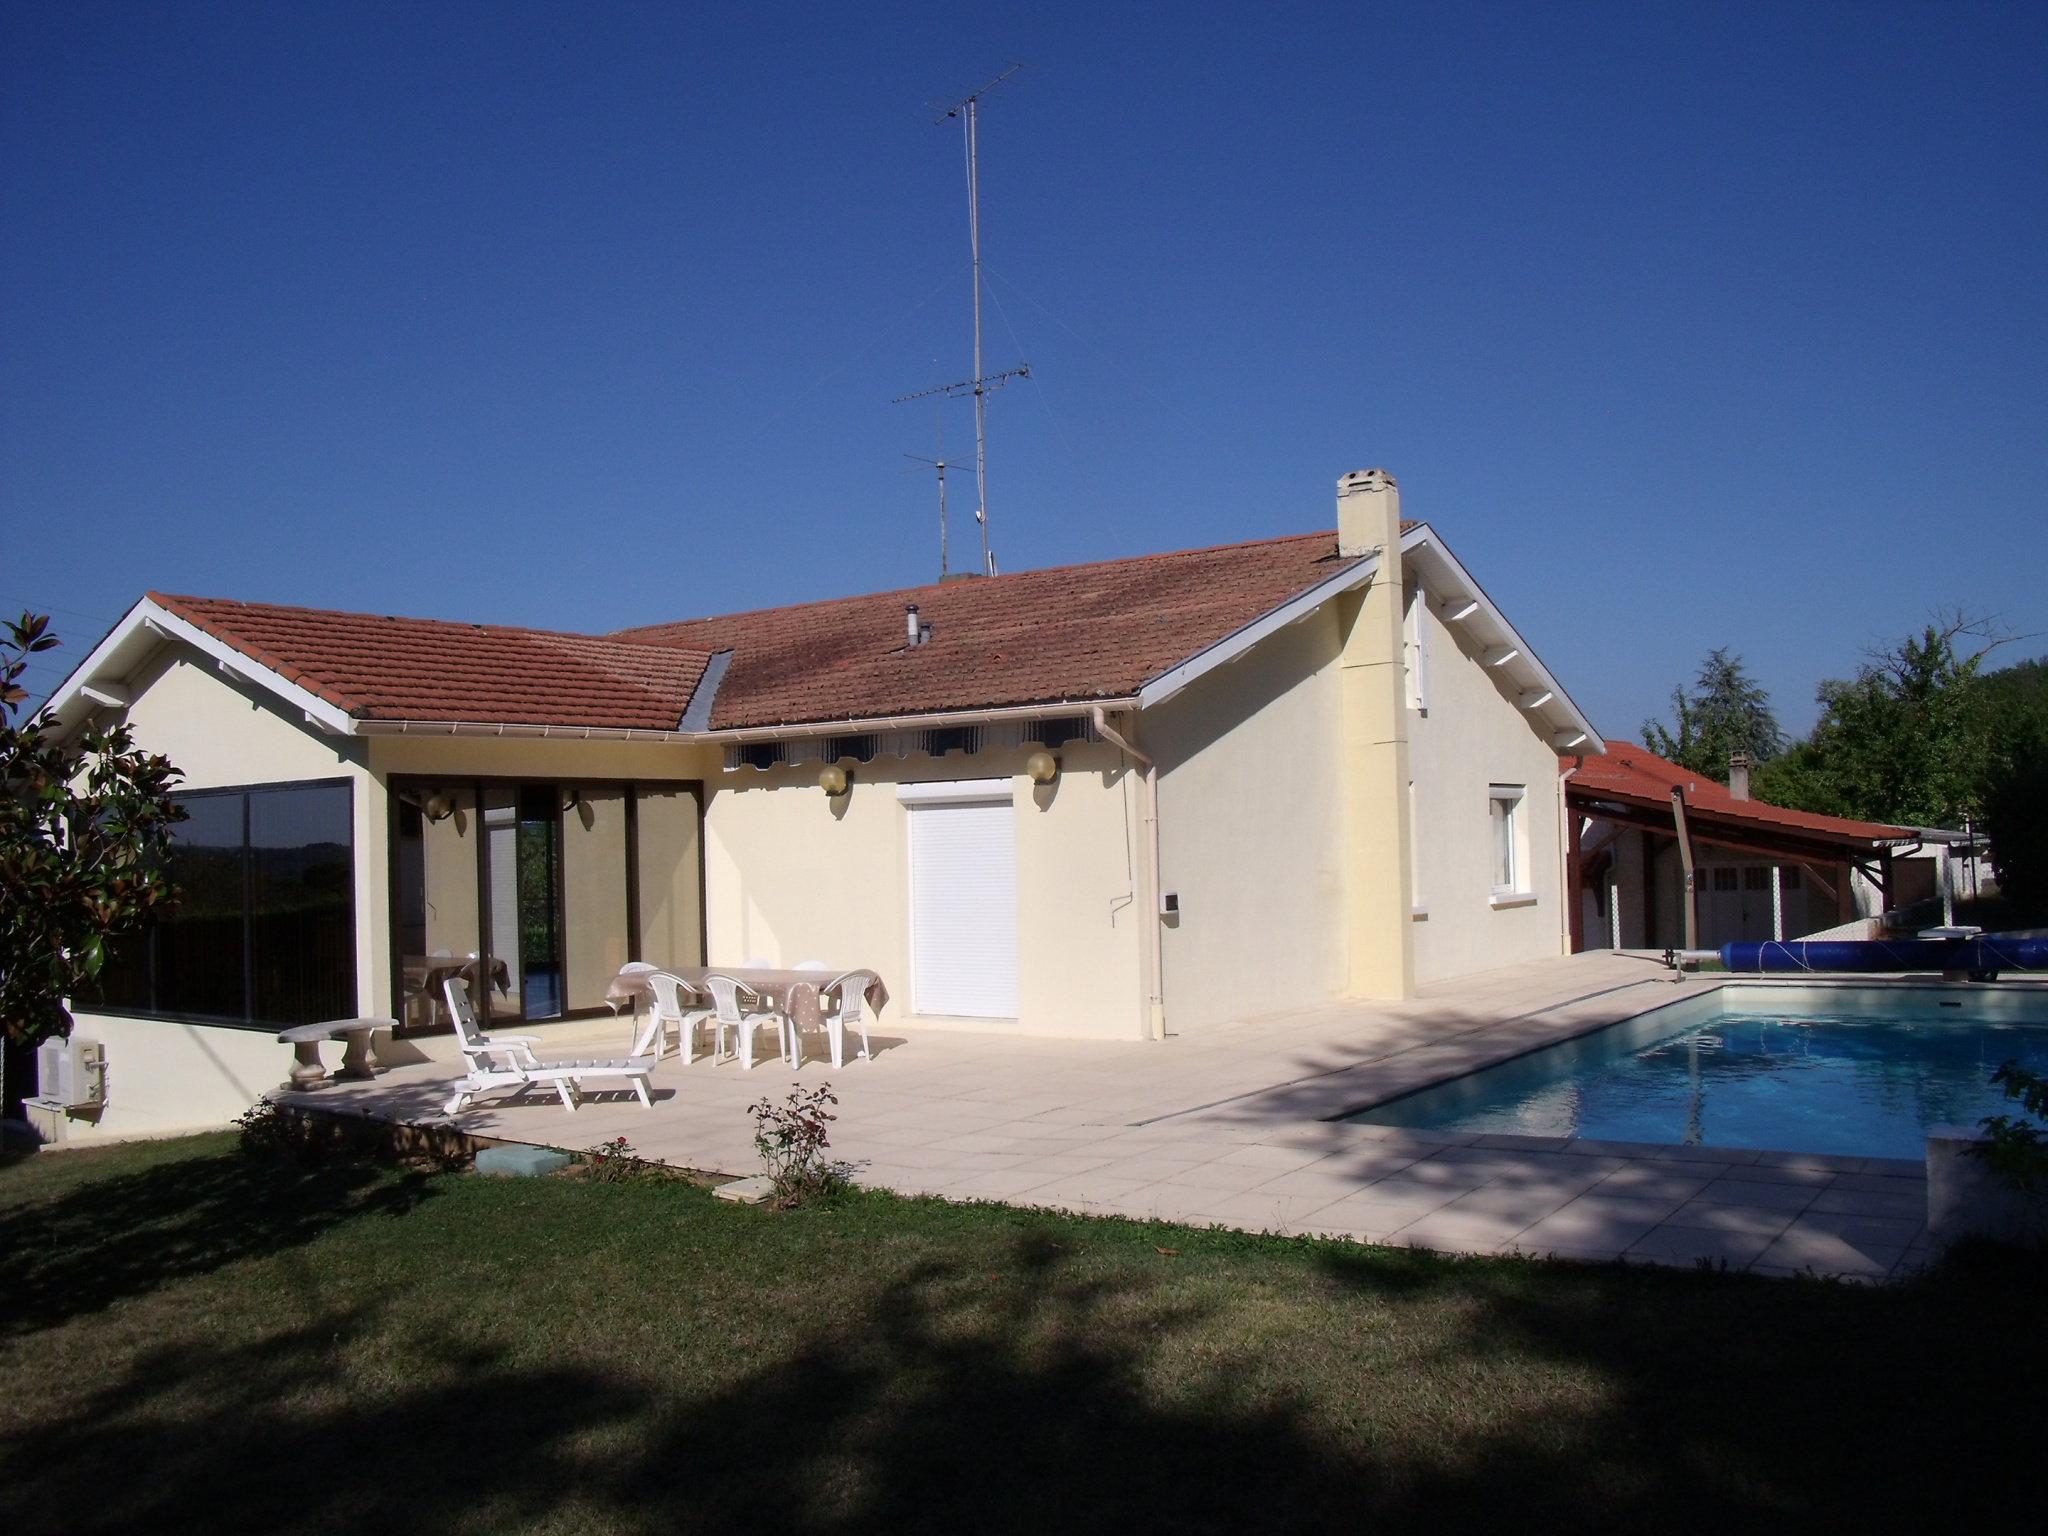 Vente maison/villa 7 pièces montayral 47500